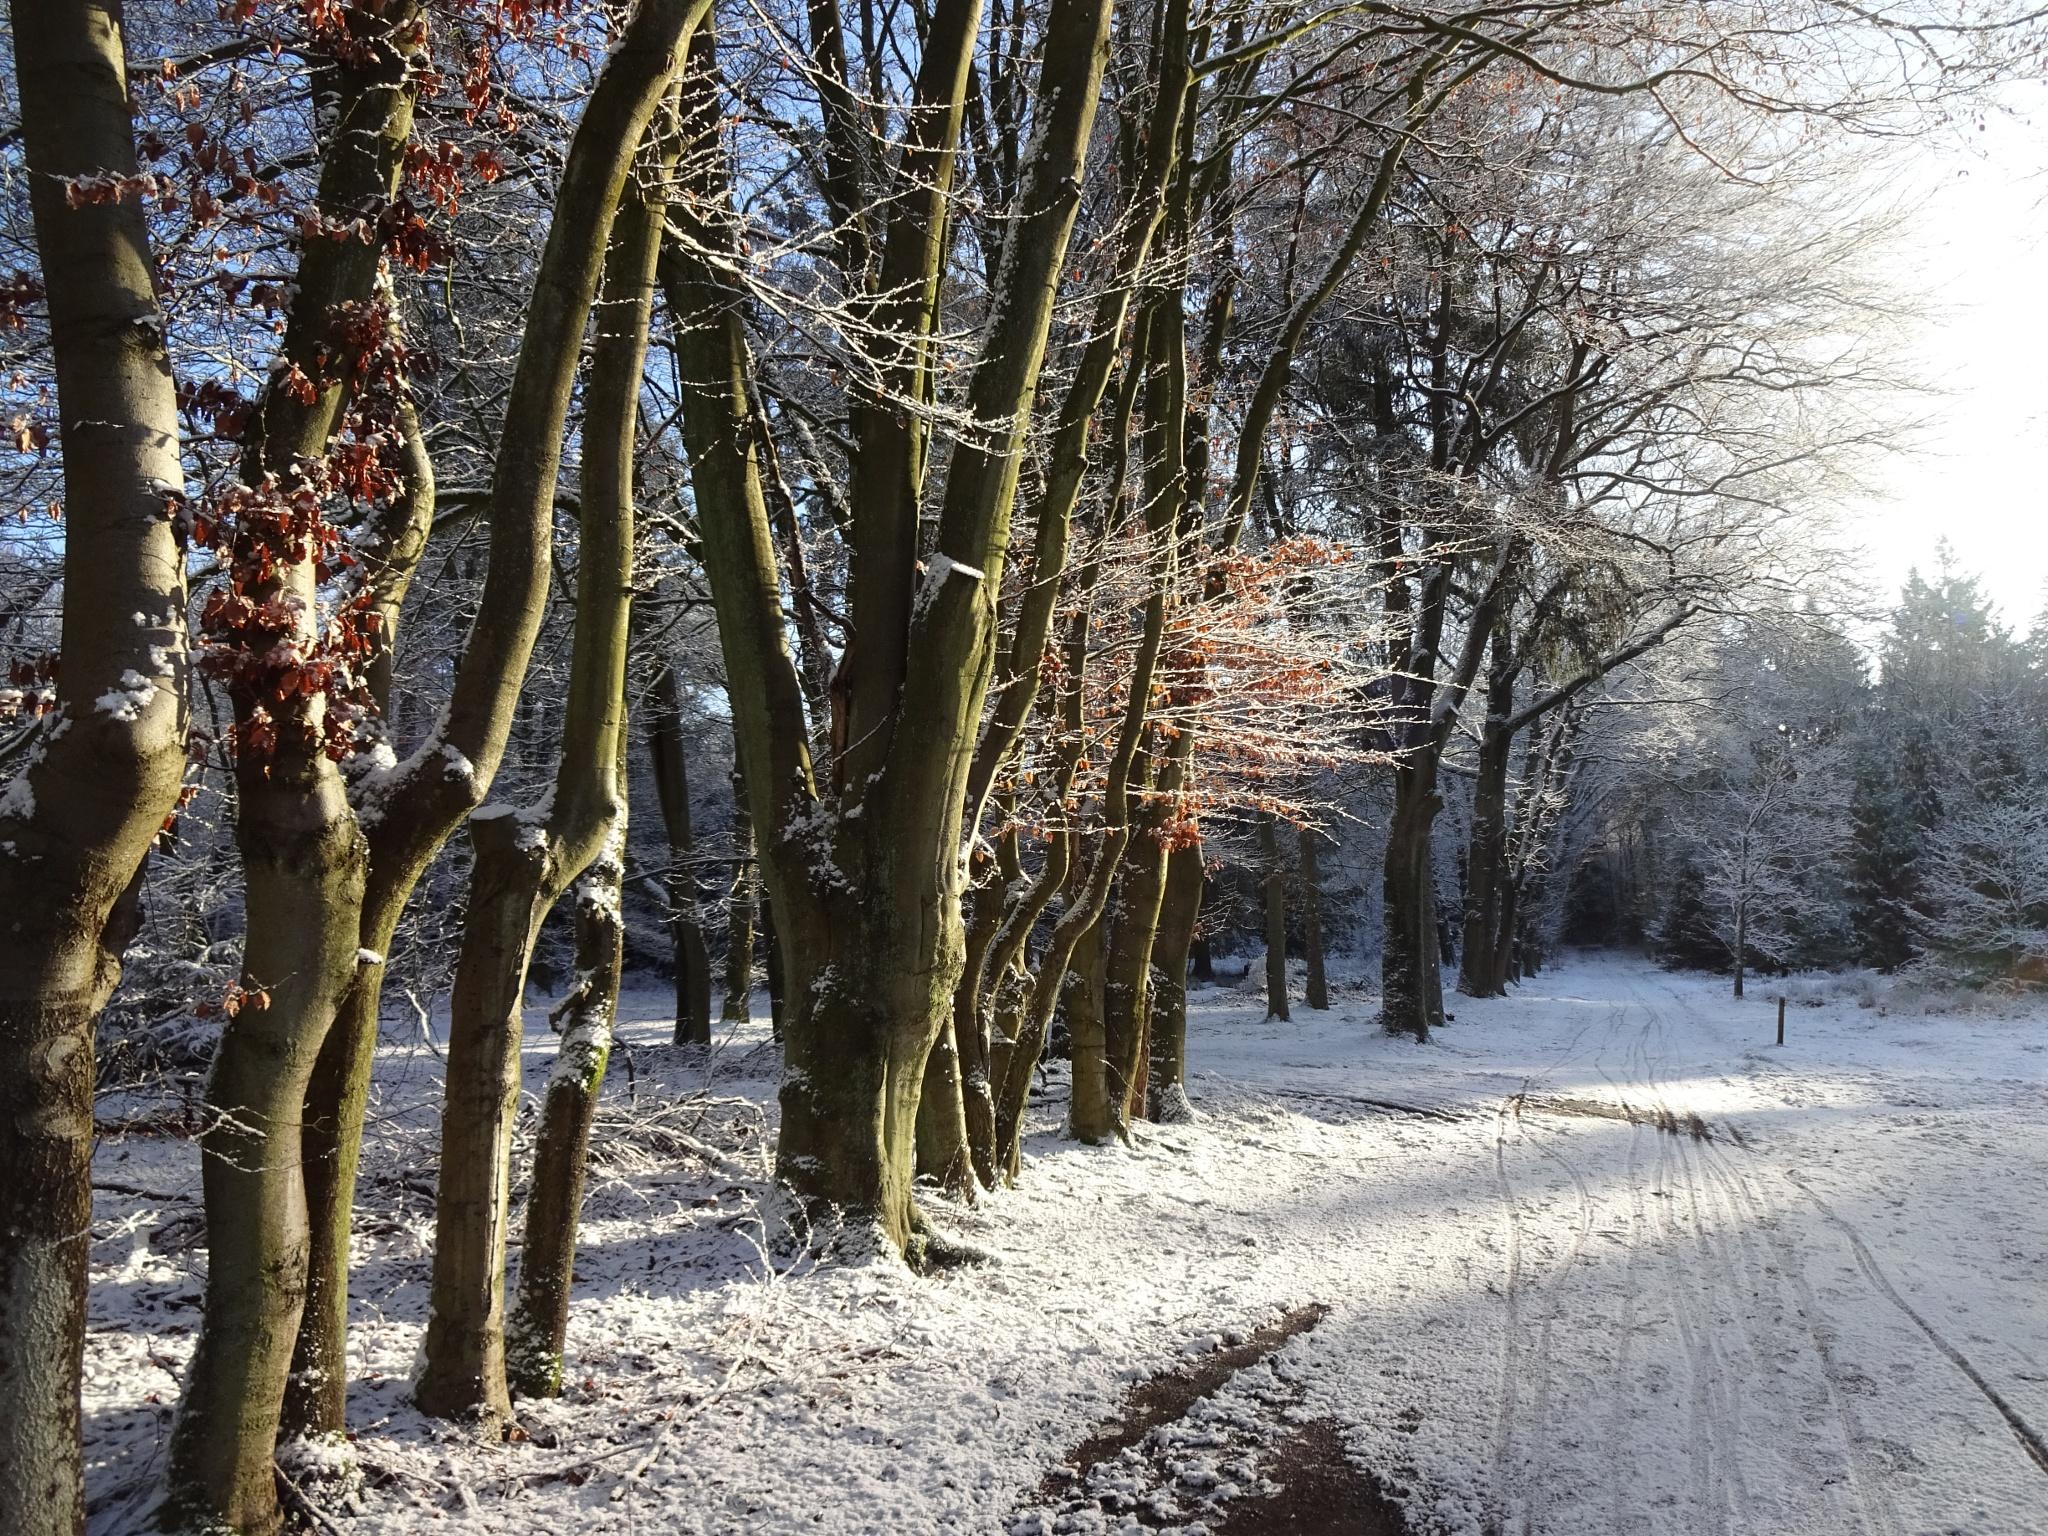 Sunny winter forest by gvanderzanden